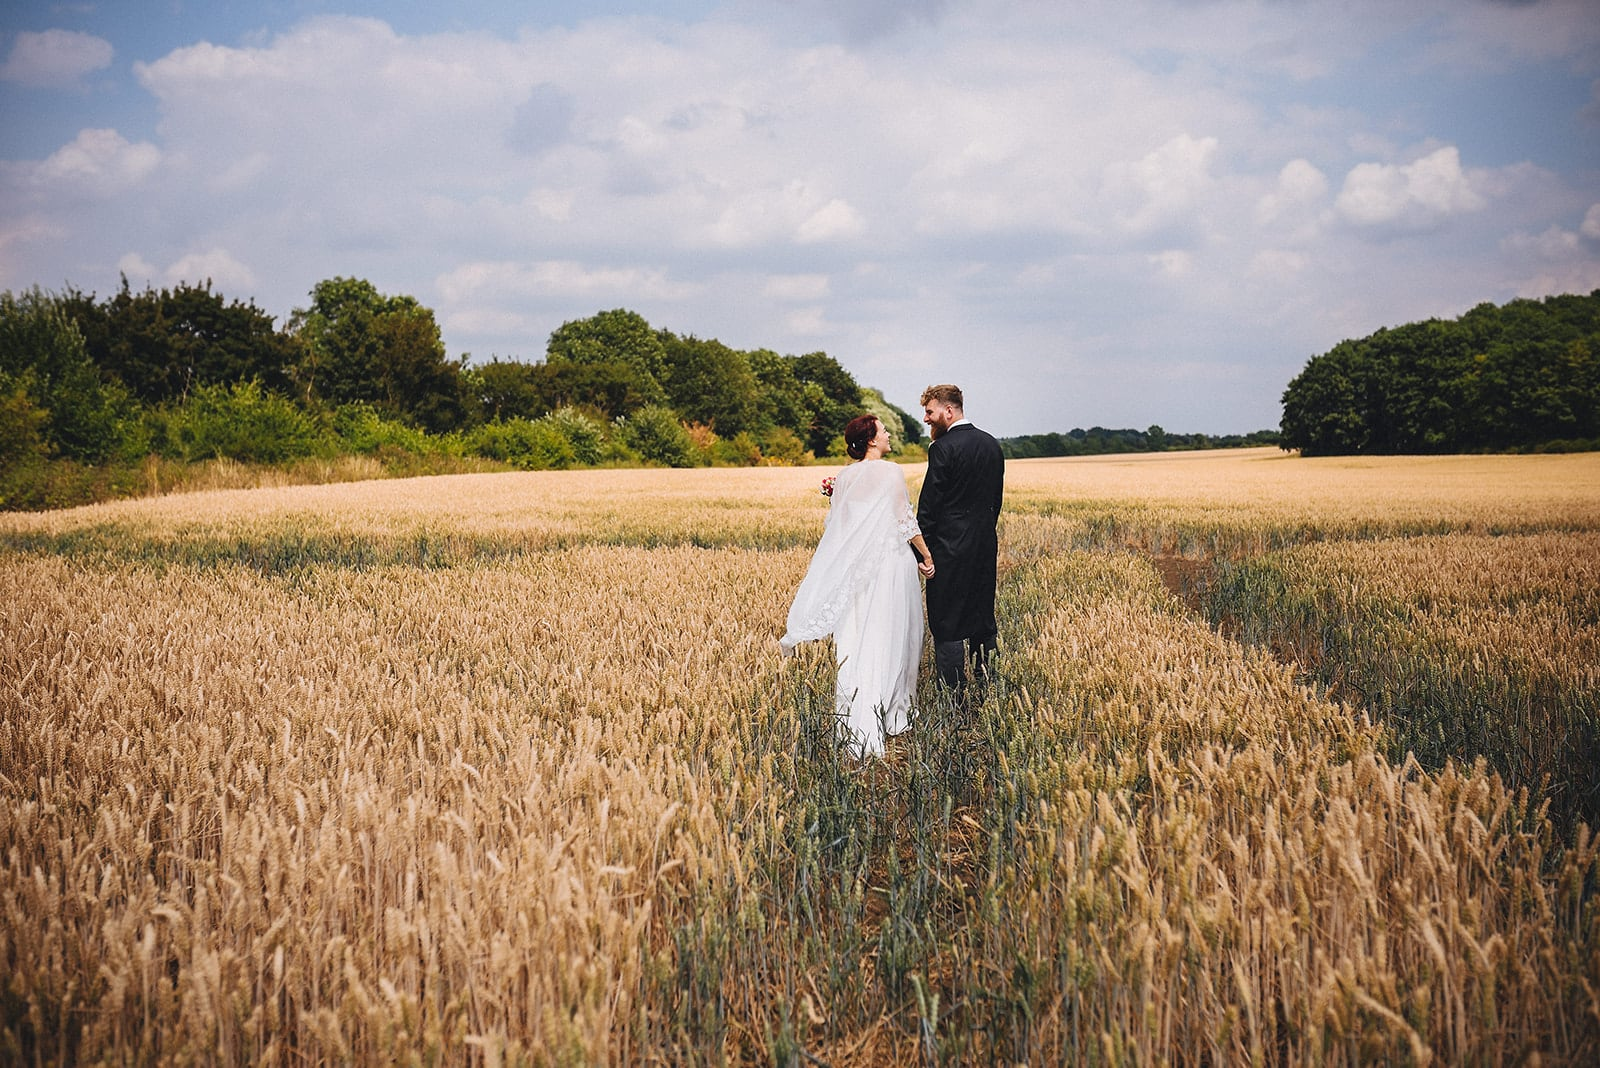 Bride and Groom walking into a corn field at their Joyful Cambridge Farm Wedding